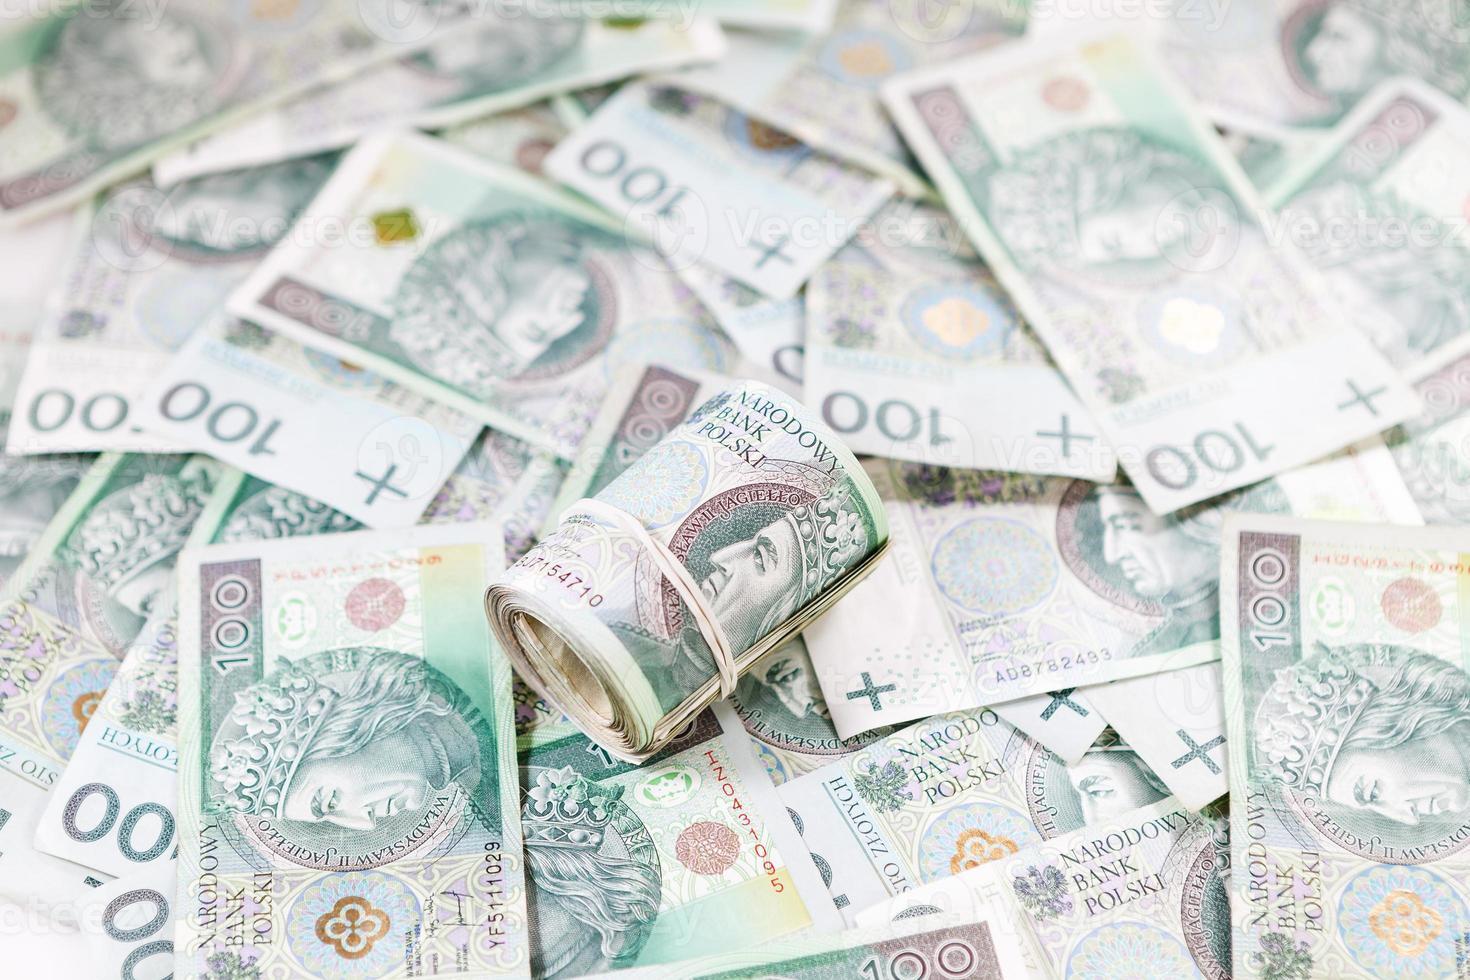 prop geld op bankbiljettenachtergrond foto